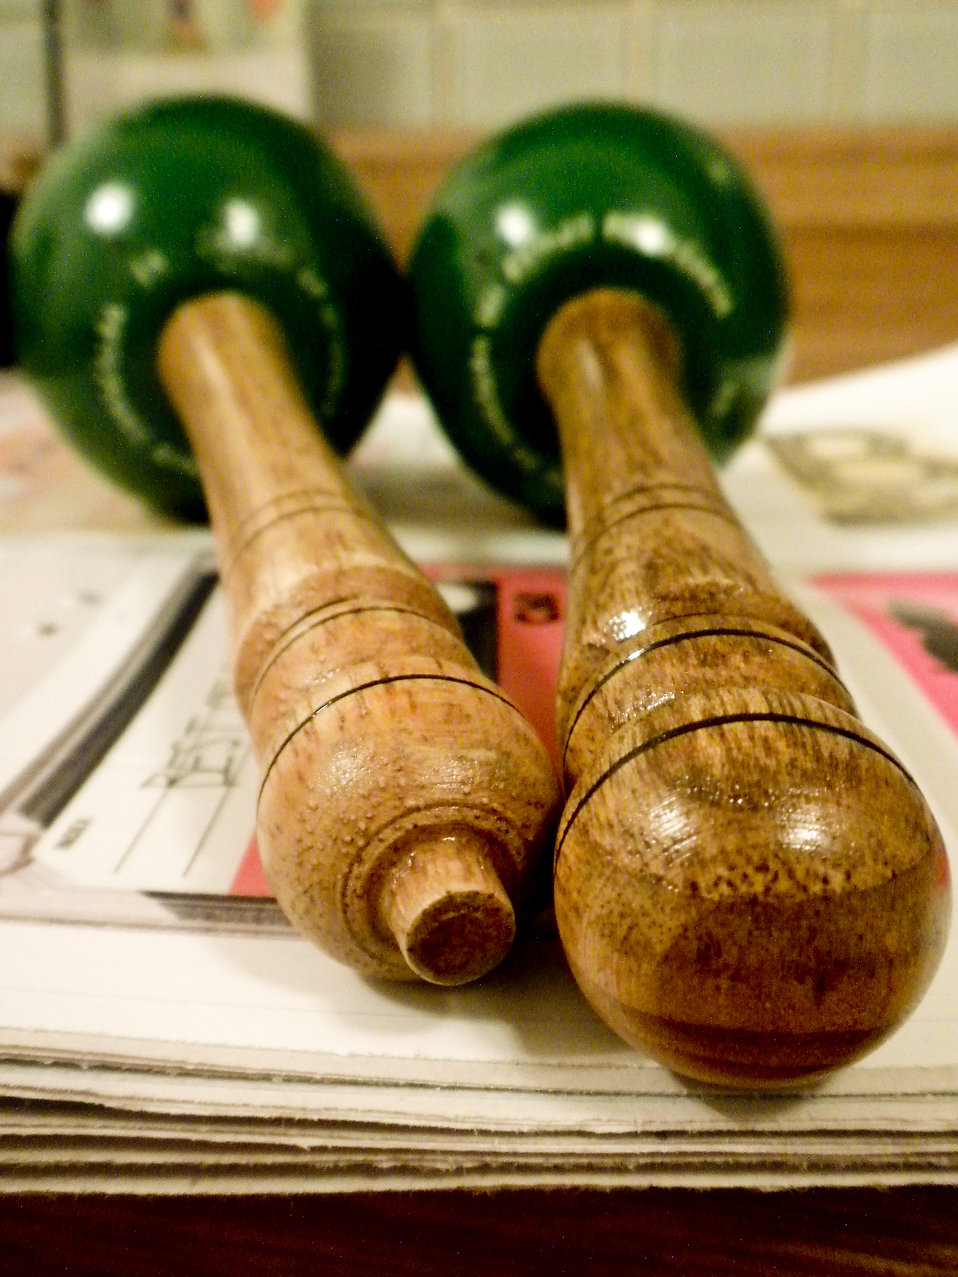 Green maracas : Free Stock Photo